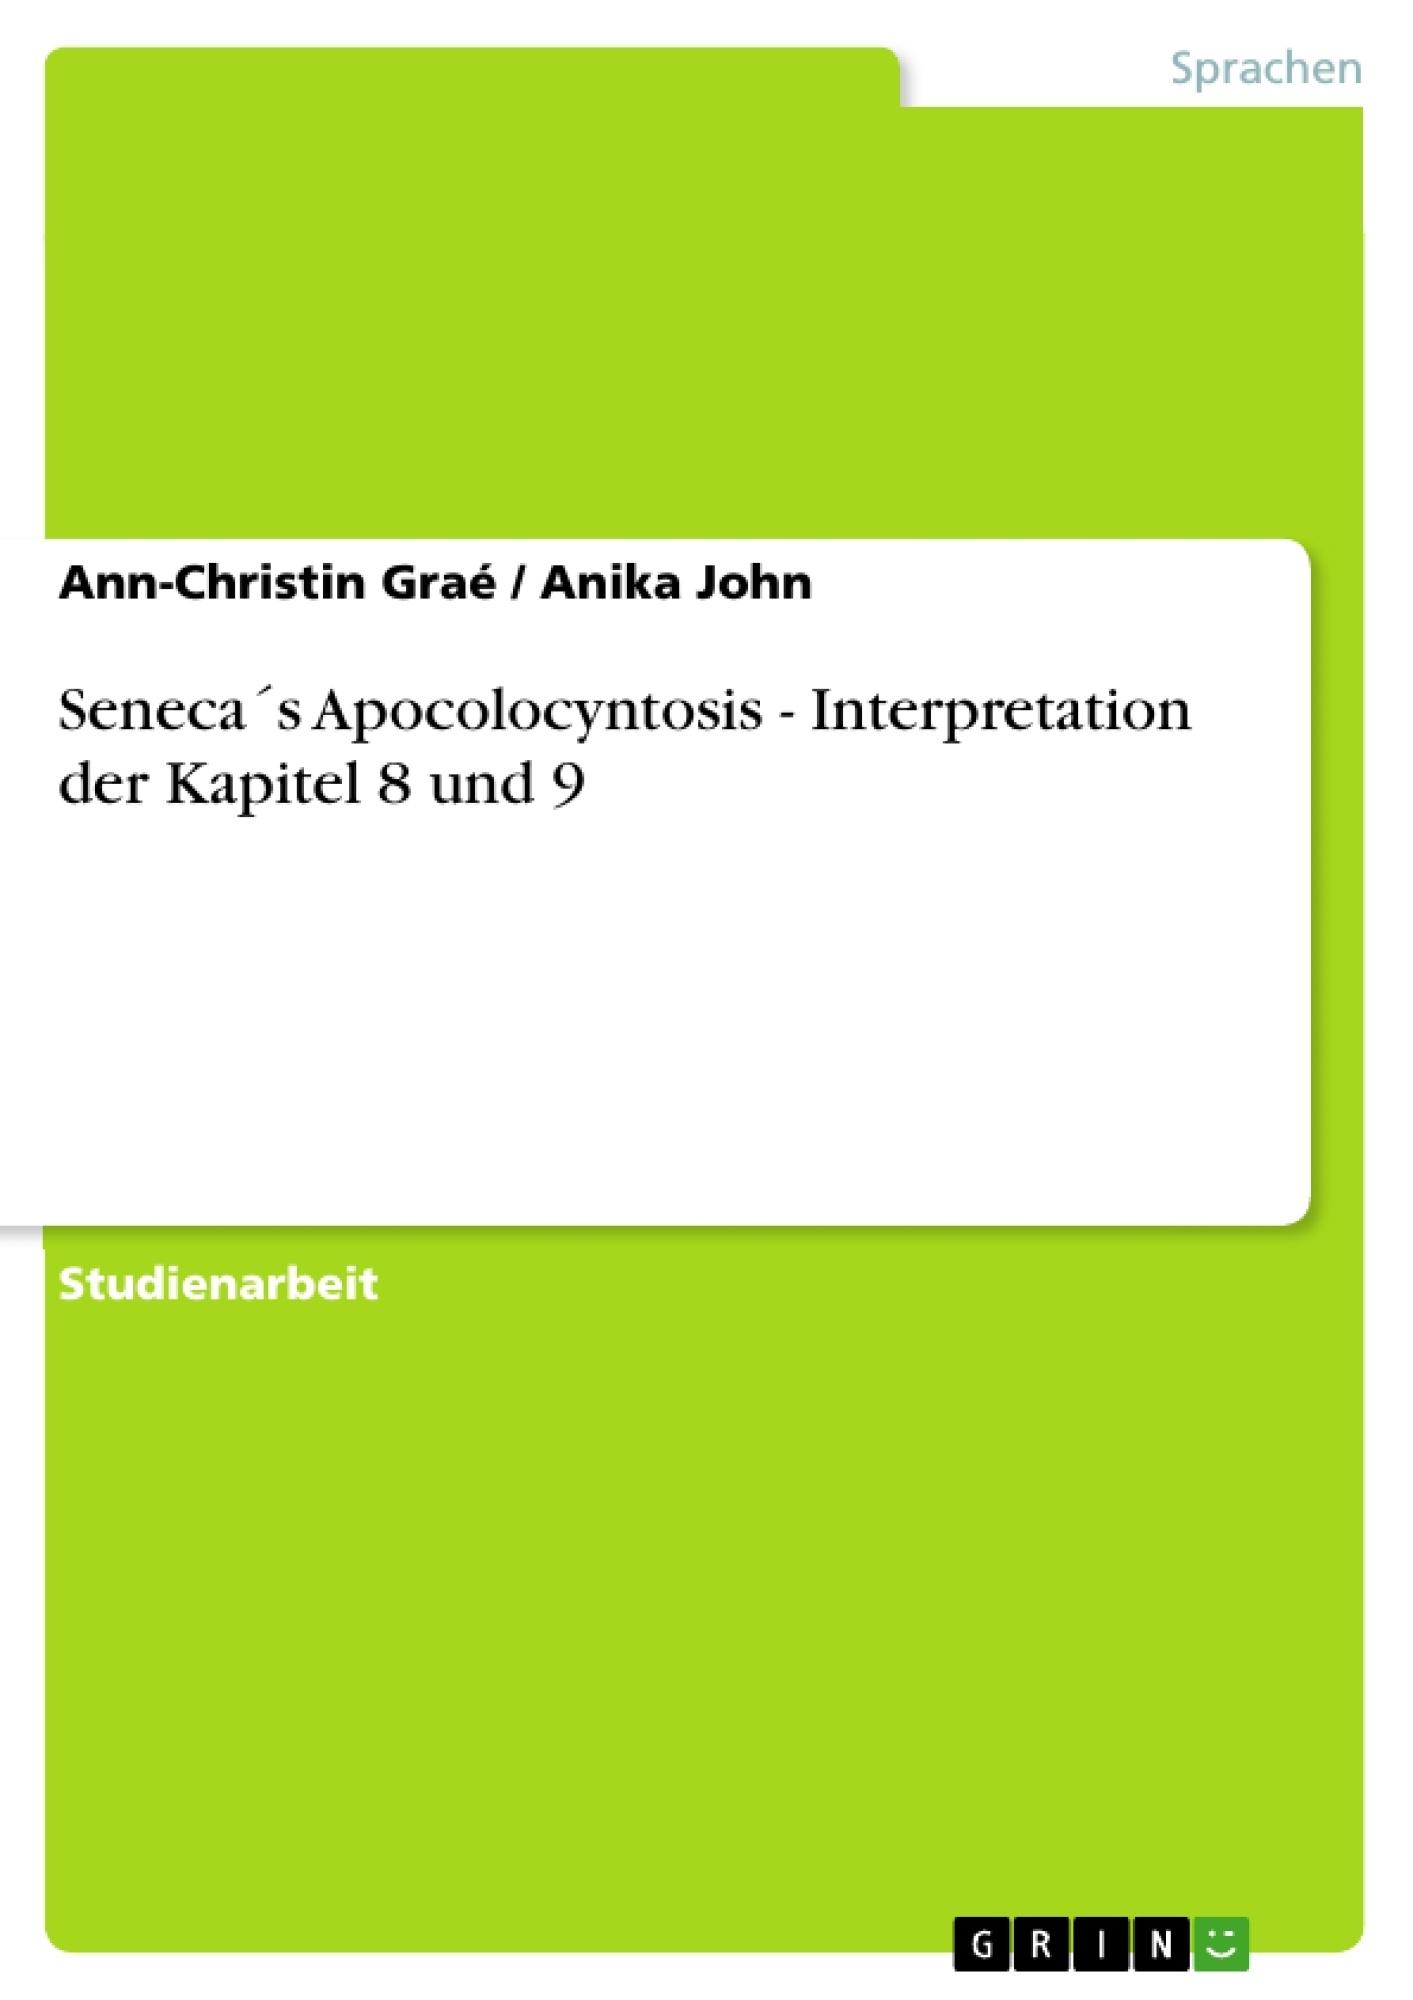 Titel: Seneca´s Apocolocyntosis - Interpretation der Kapitel 8 und 9